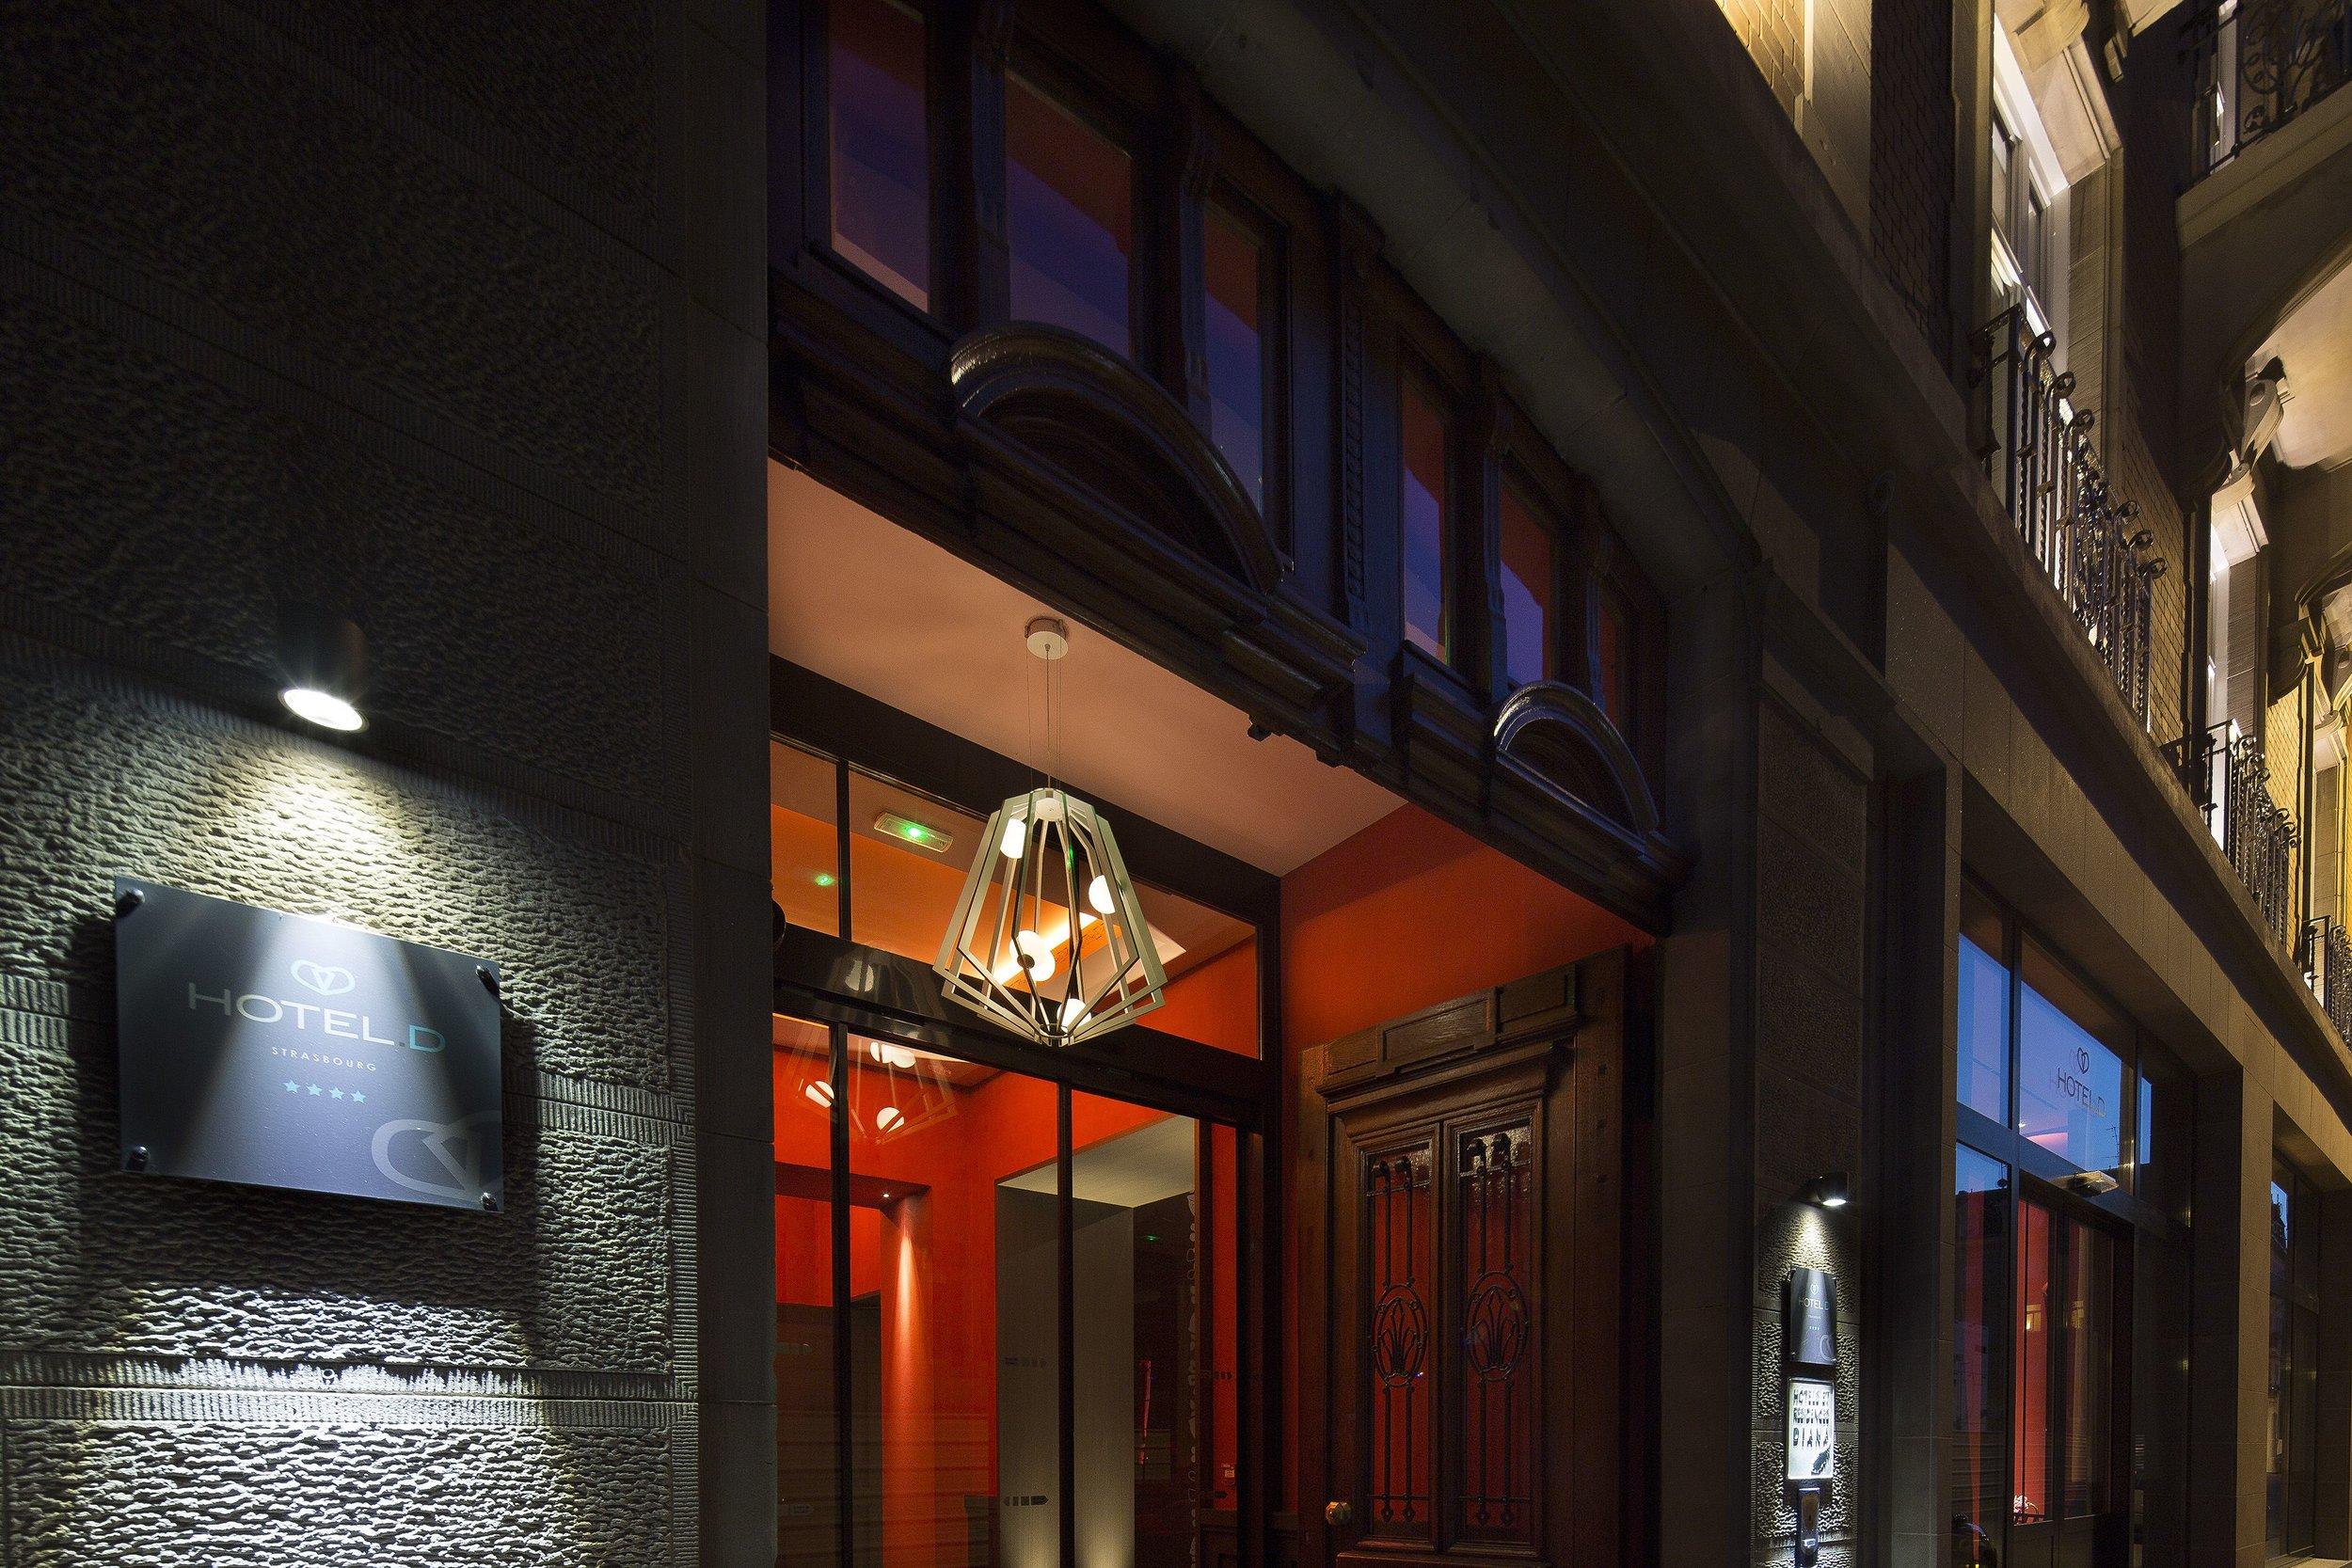 hotel-d-strasbourg-photo-christophe bielsa-facade-23 bd.jpg